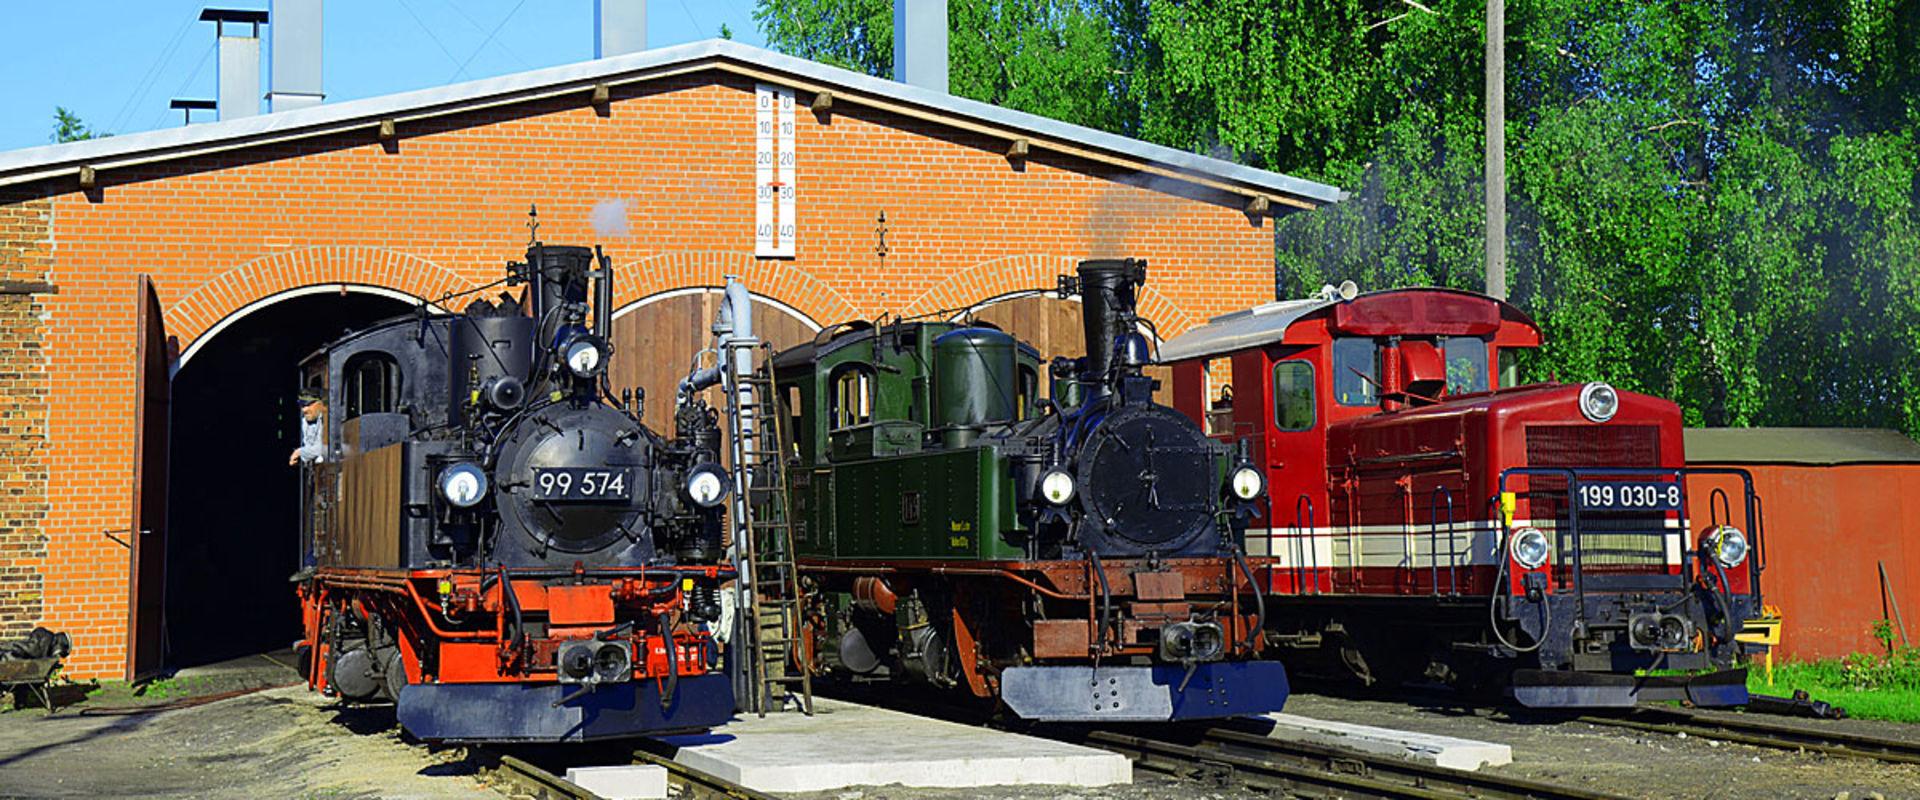 Lokomotiven vor dem Schuppen in Mügeln.  © Christian Sacher